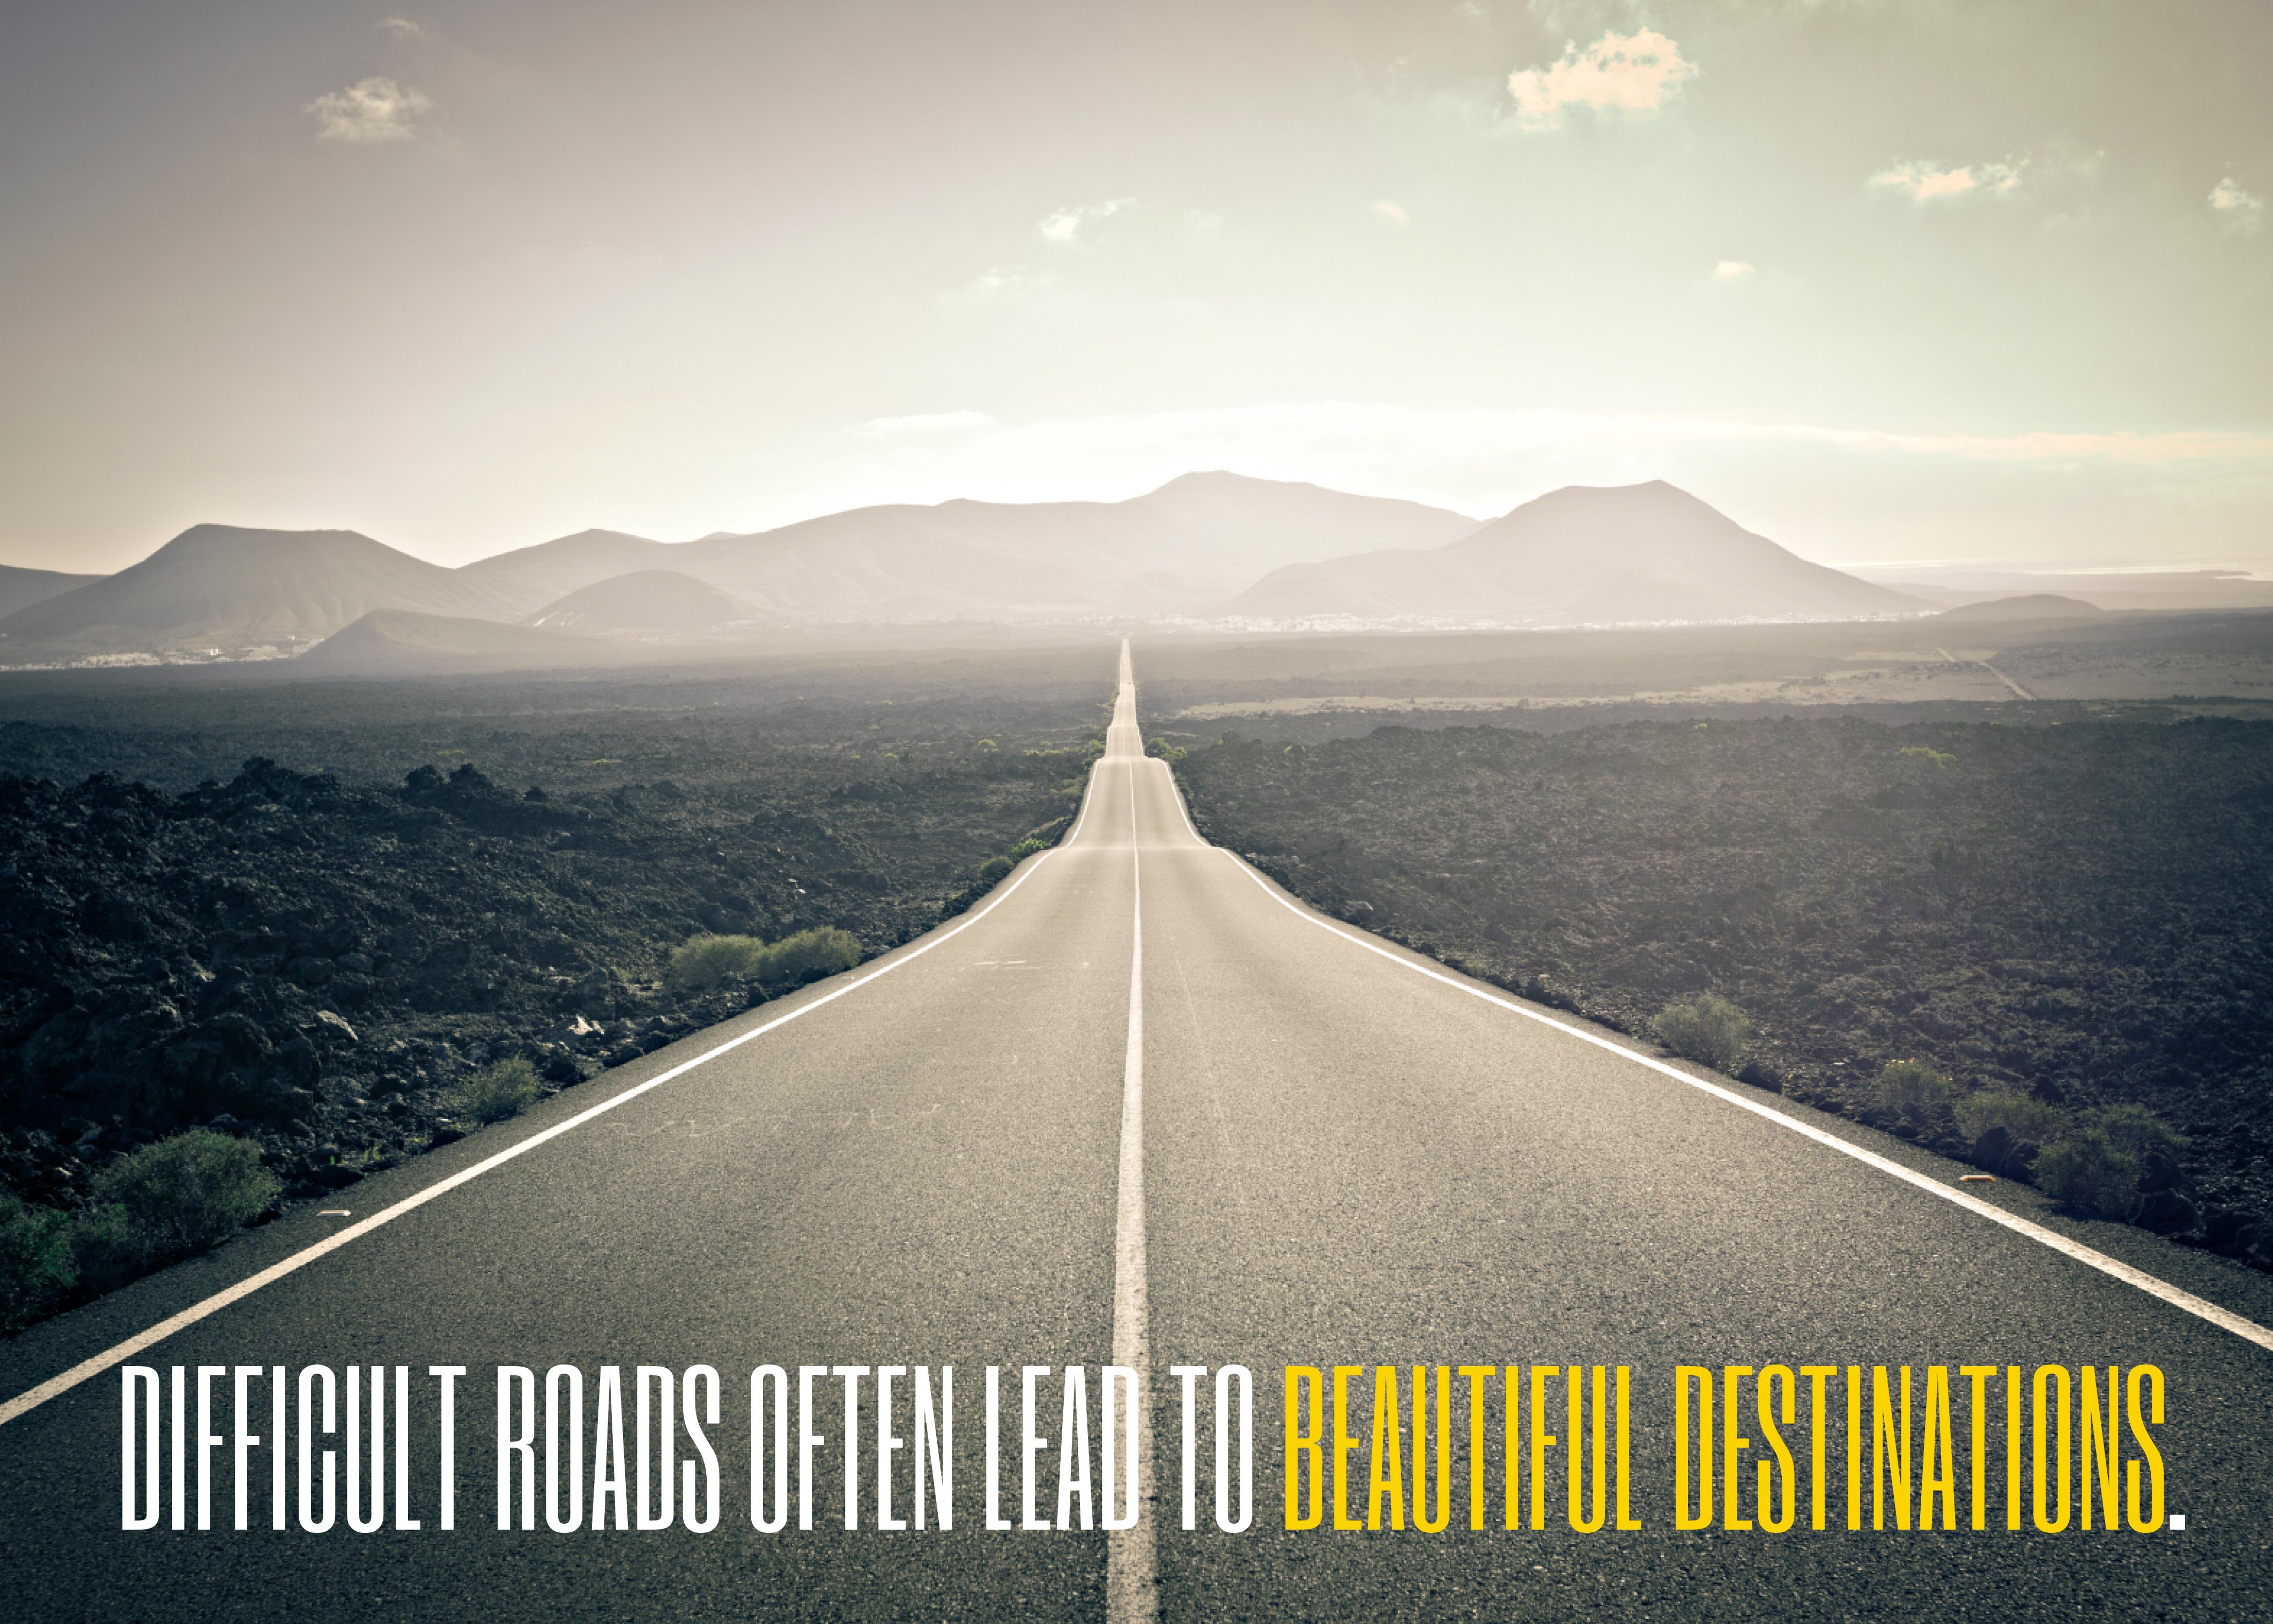 Roads Often Lead To Beautiful Destinations